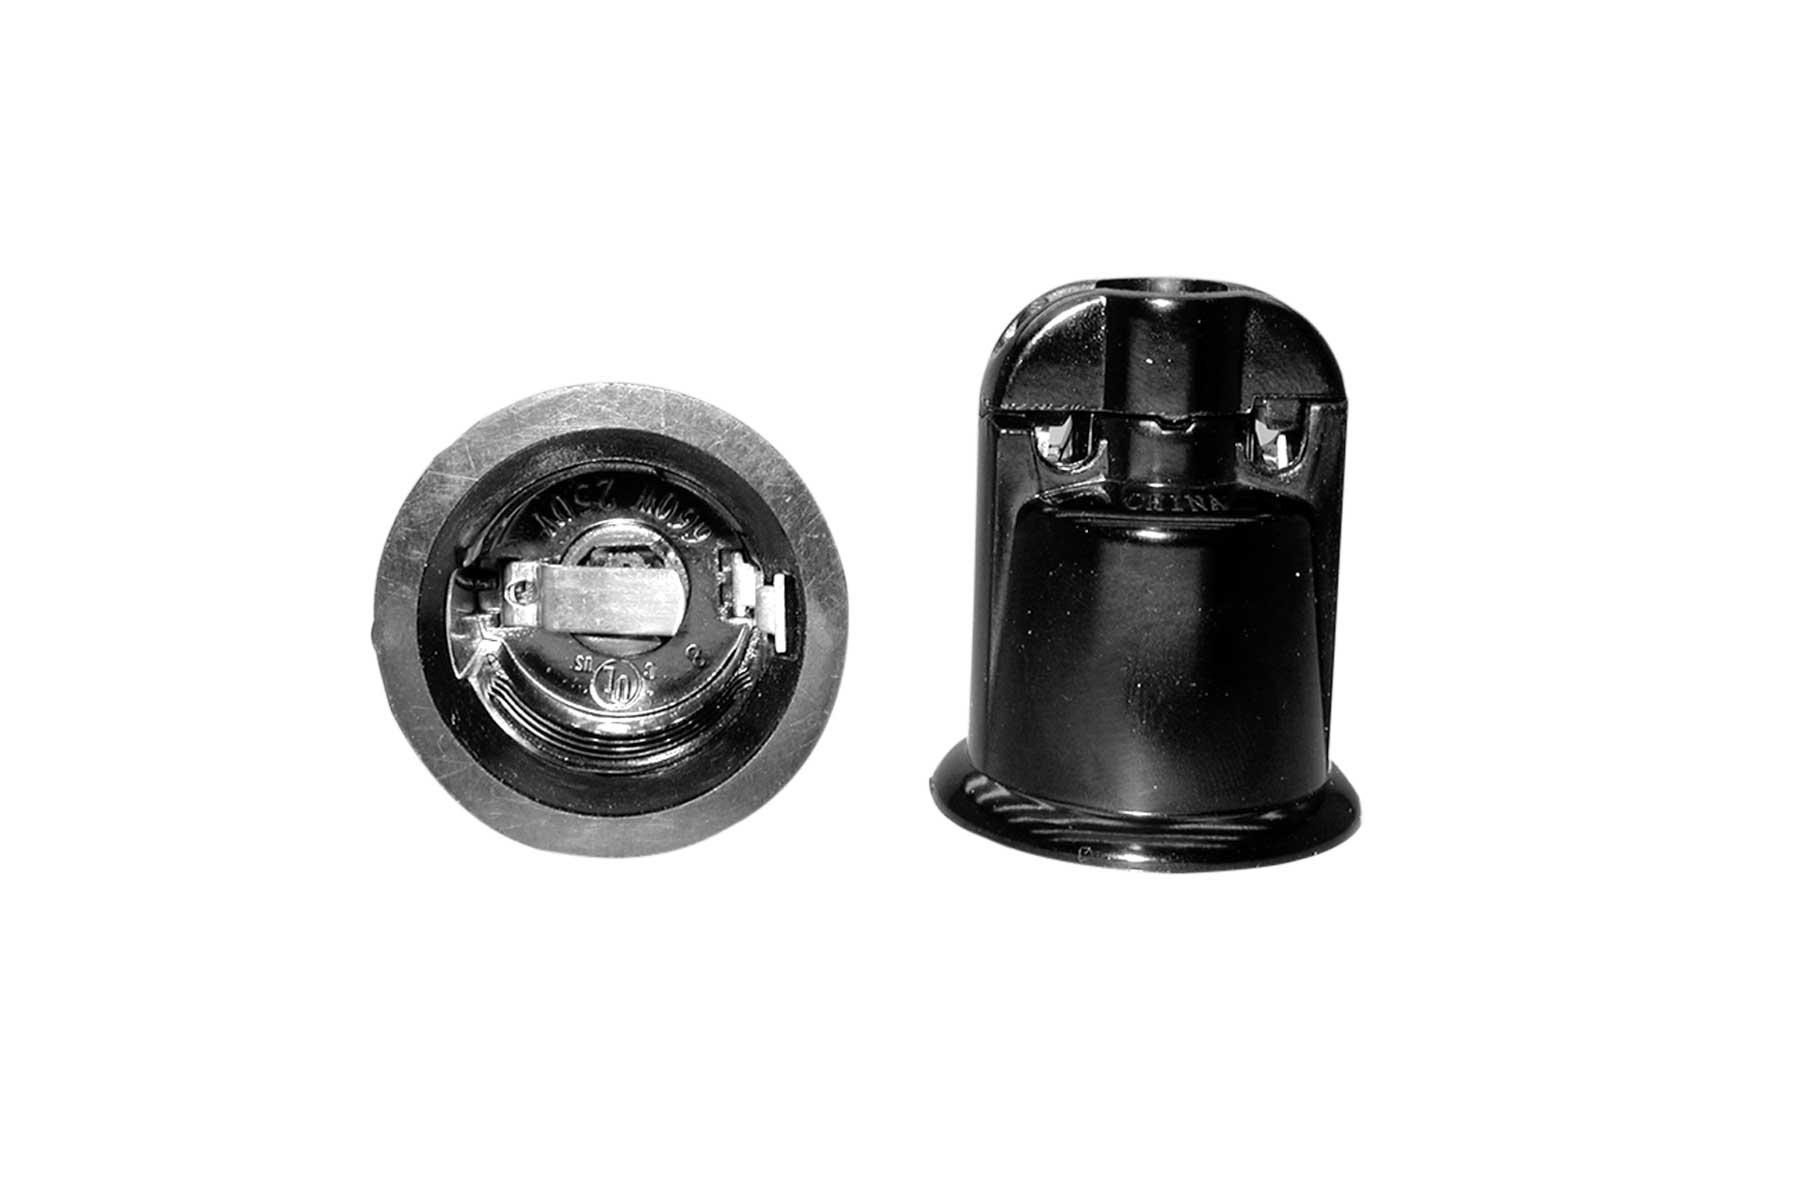 Medium Base Weatherproof Phenolic Pin Type Incandescent Light Socket